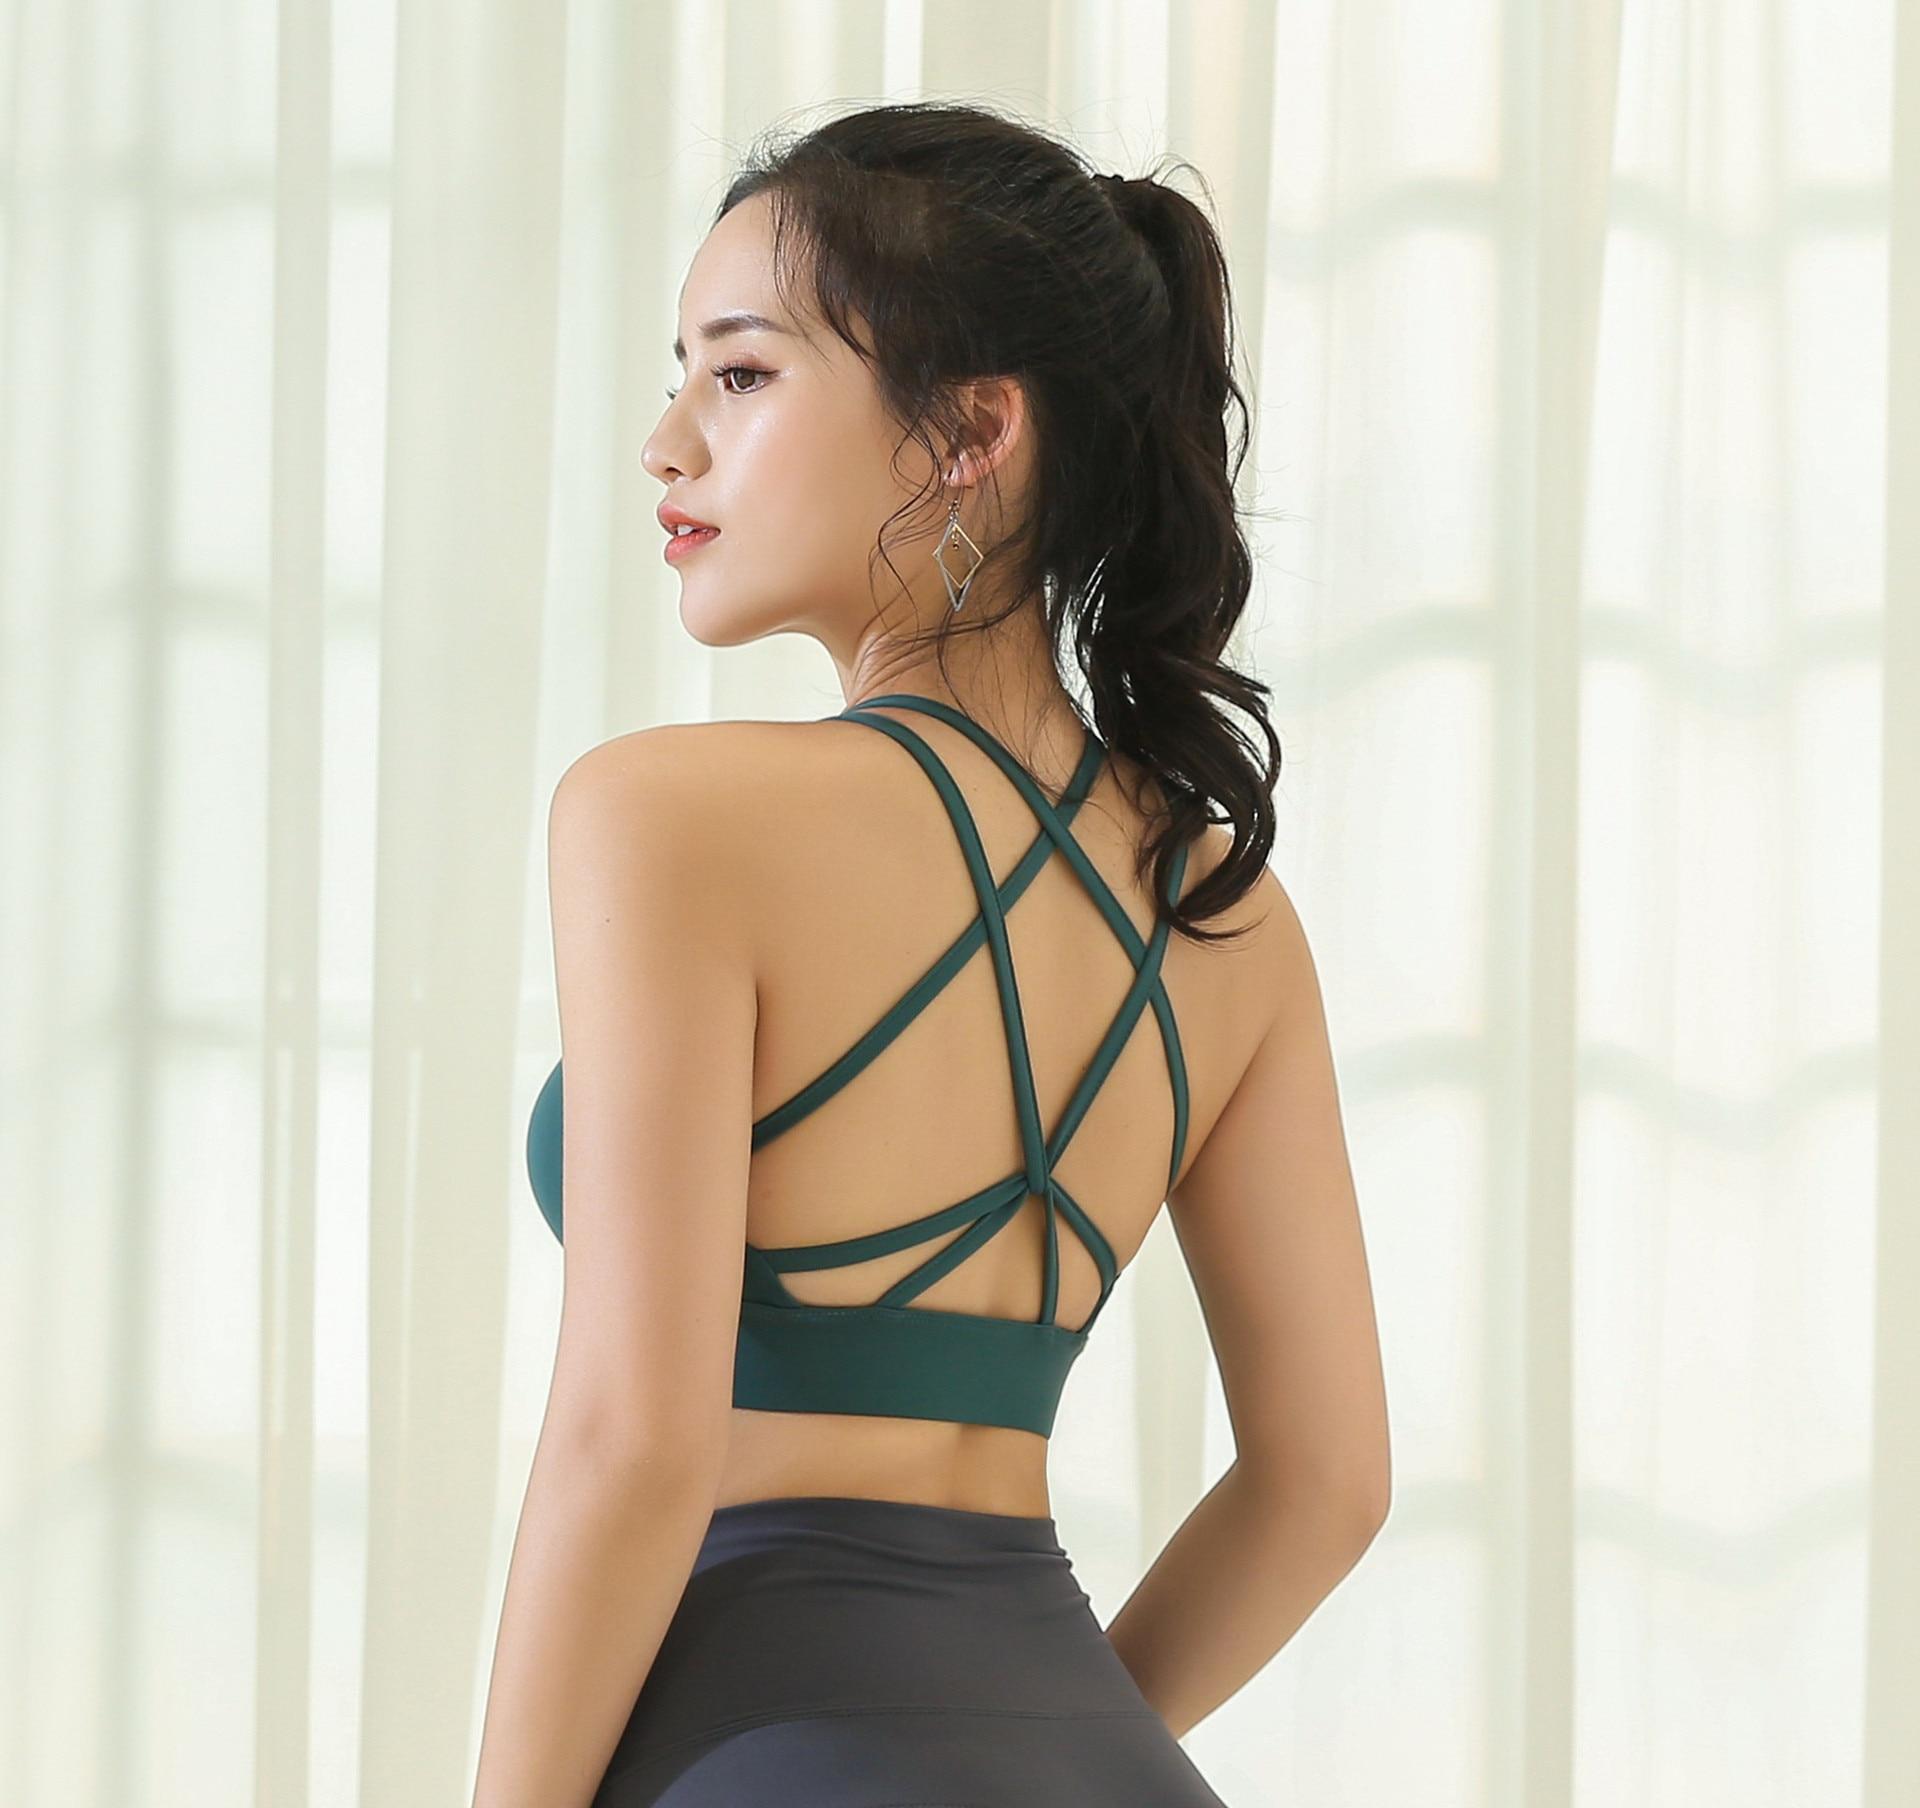 Wmuncc Sexy Yoga Tops Women Padded Sports Bra Shakeproof Tank Top Cross Strappy Running Workout Gym Top Tank Fitness Shirt Vest